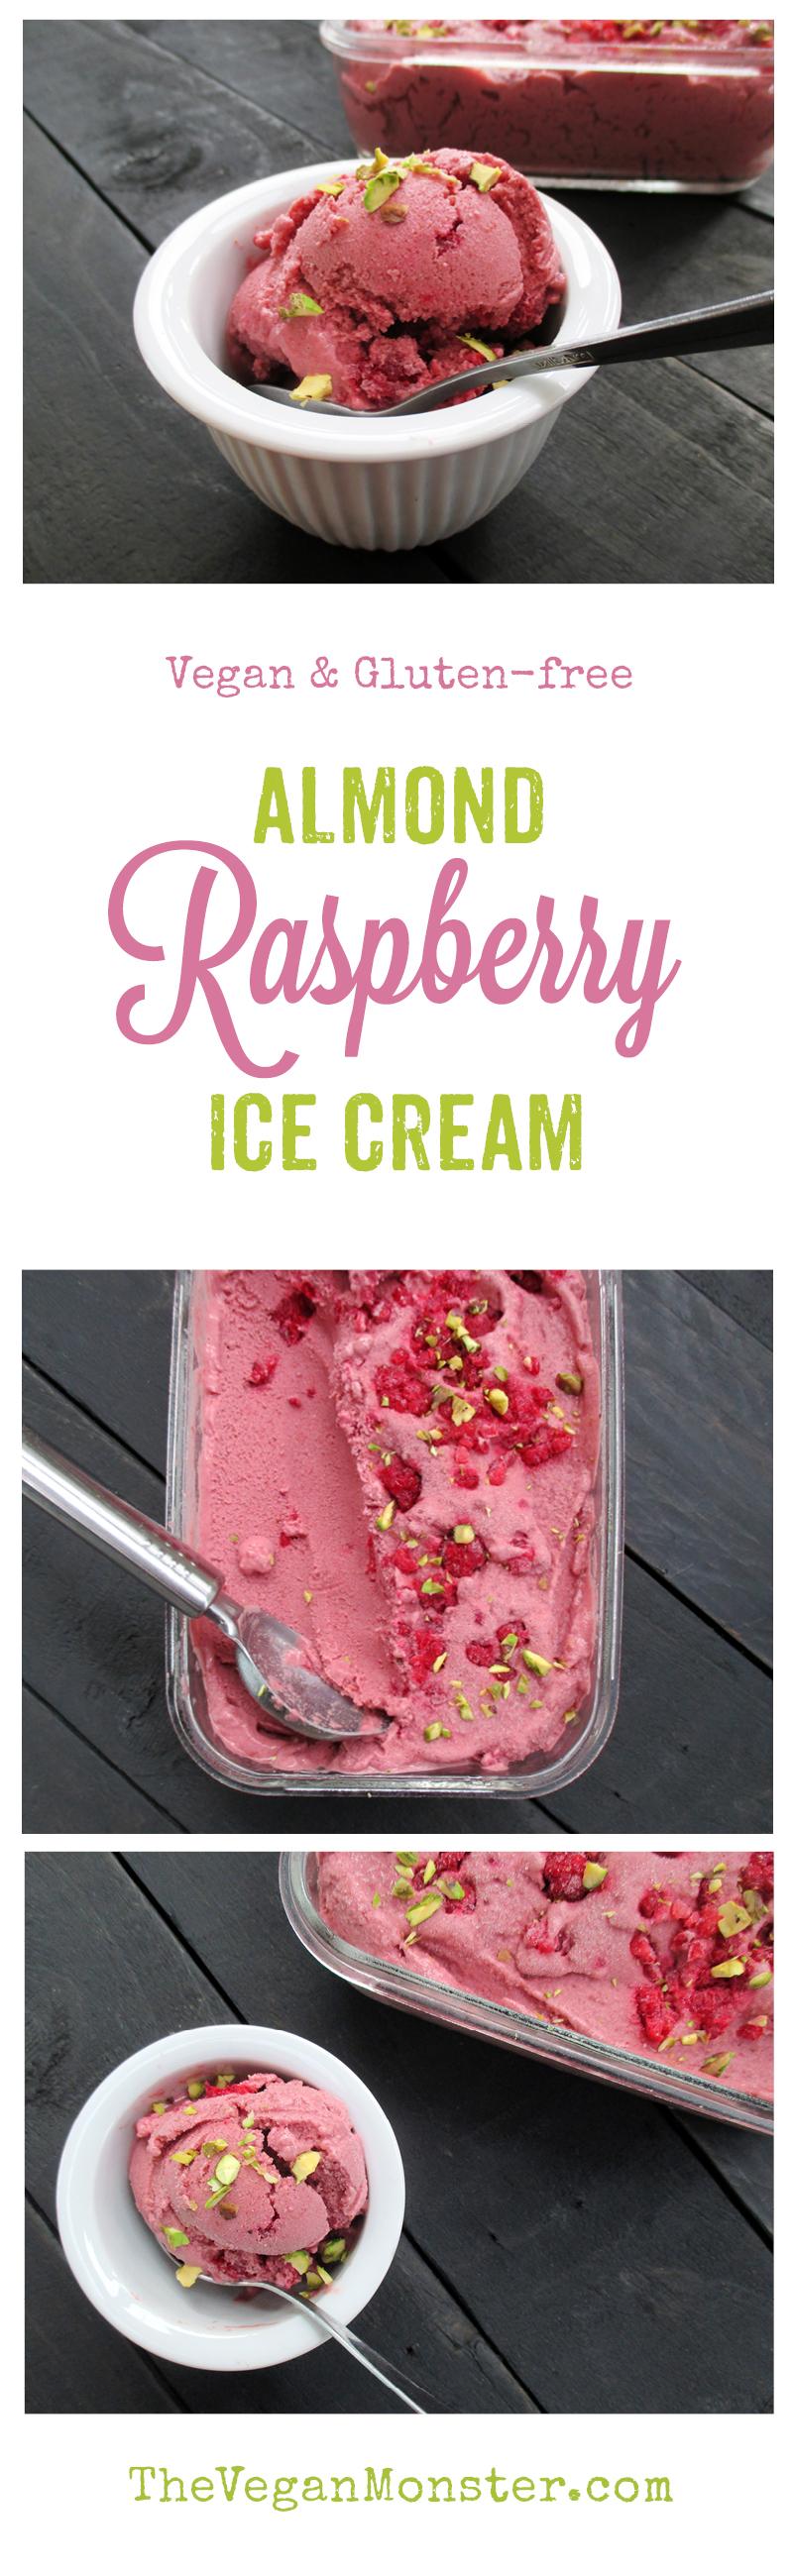 Vegan Gluten-free Refined Sugar Free Almond Raspberry Ice Cream Recipe